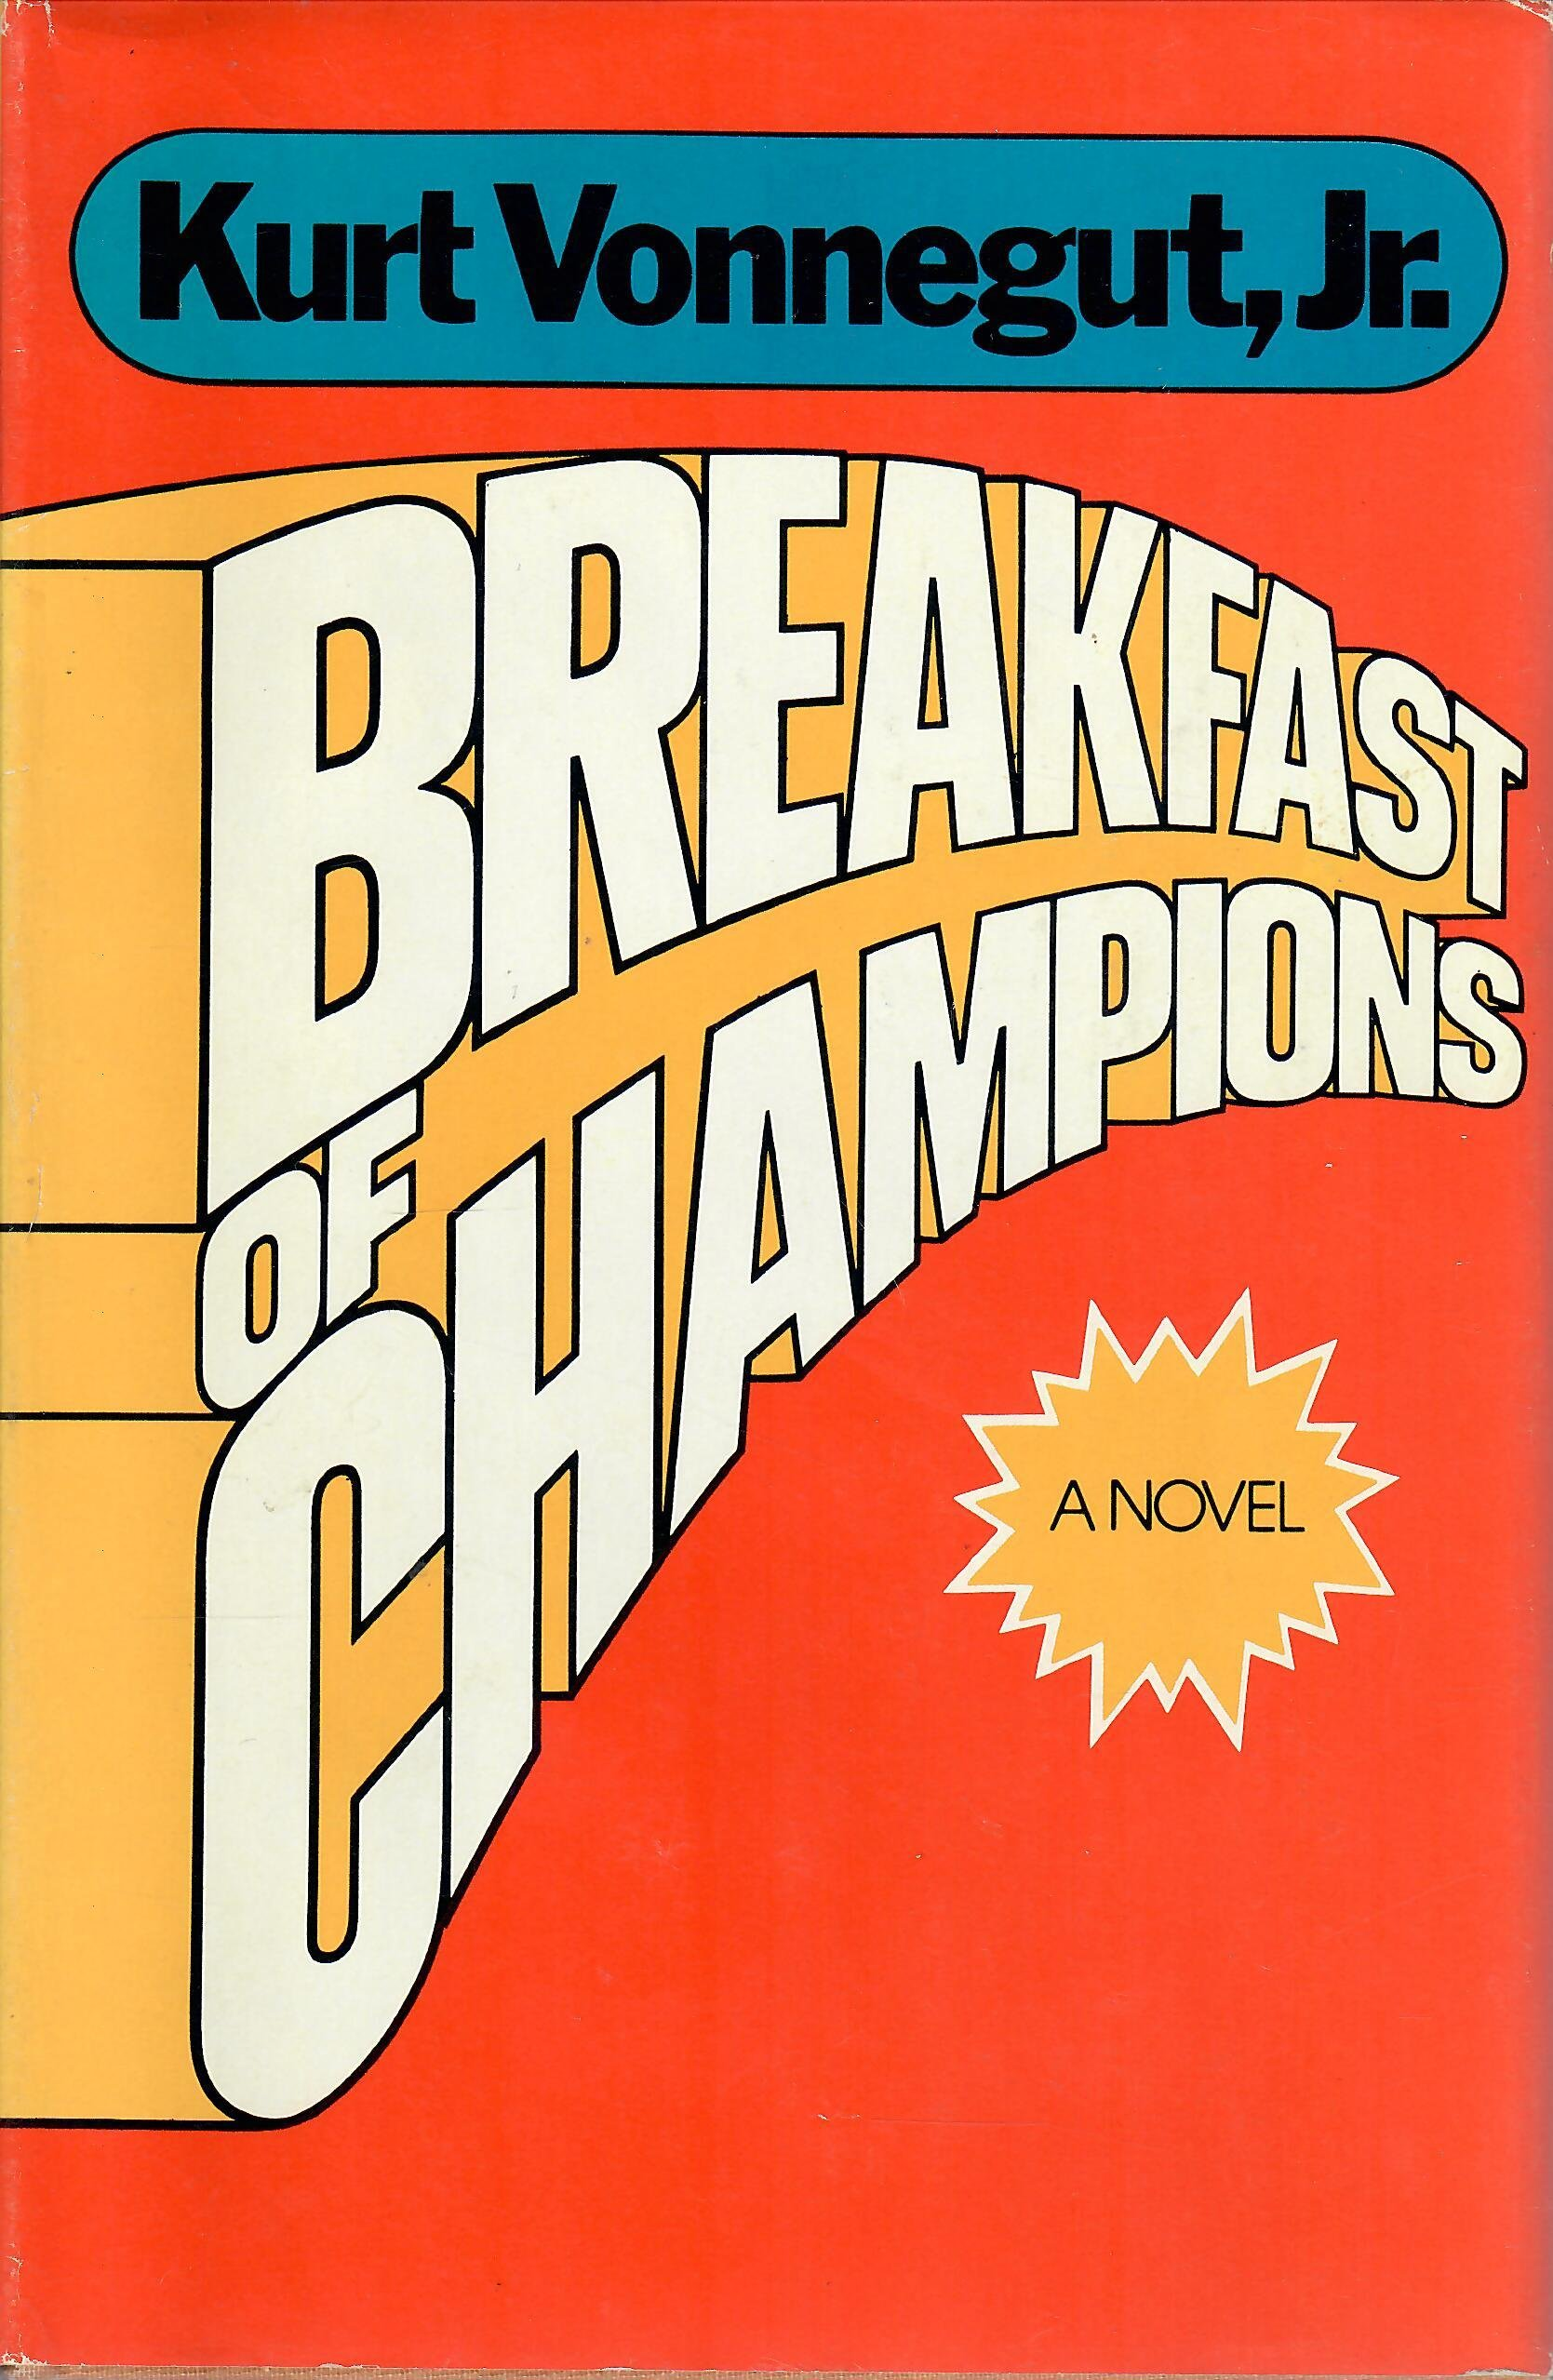 breakfast of champions Every Kurt Vonnegut Novel Ranked in Order of Relevance